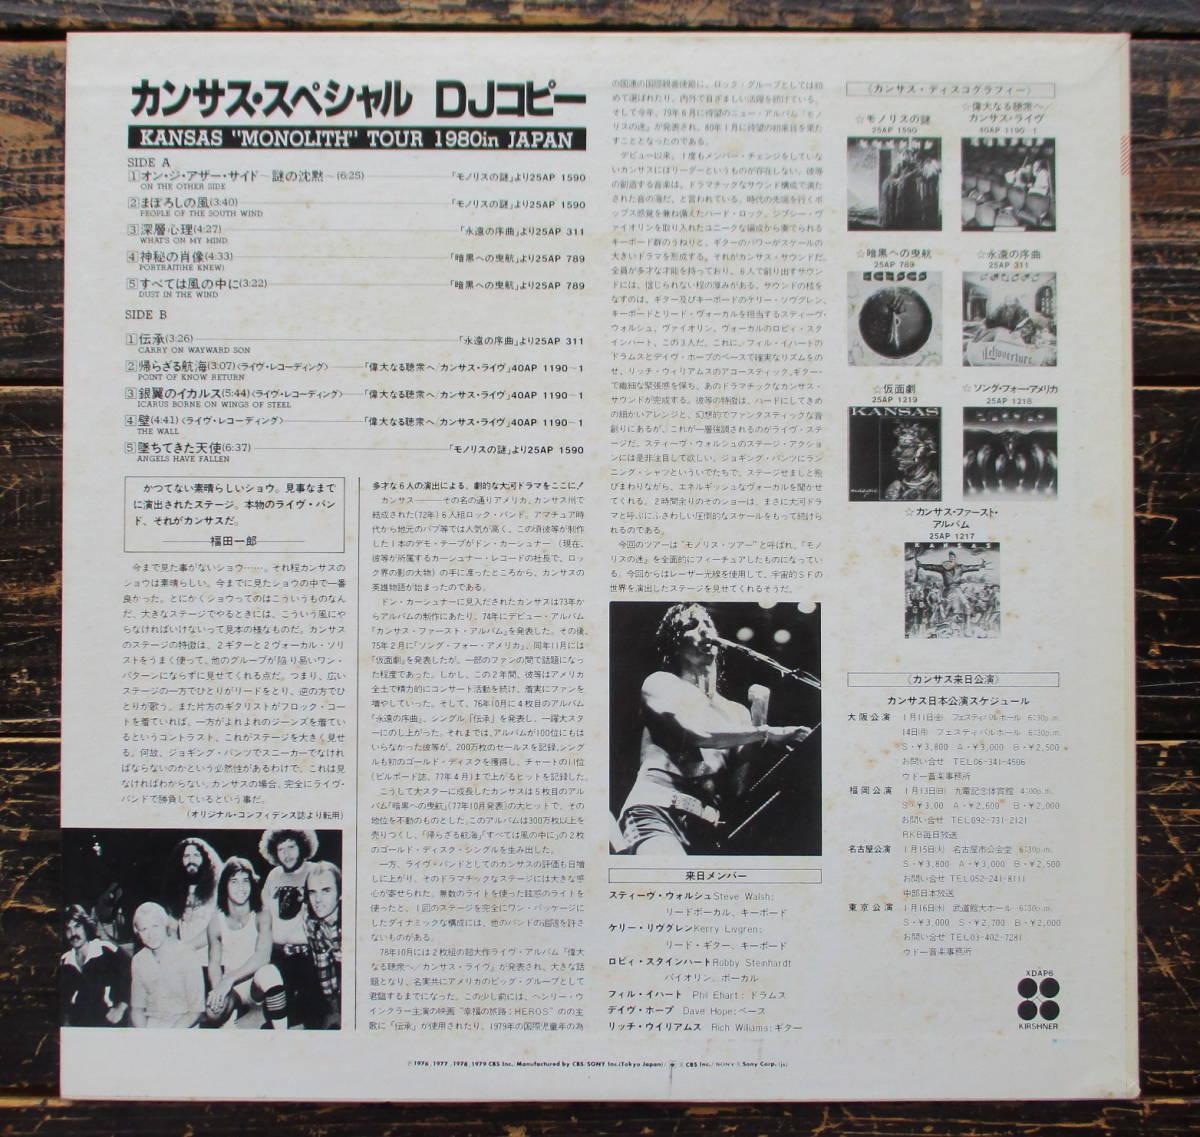 LP【KANSAS MONOLITH TOUR 1980 in JAPAN カンサス・スペシャルDJコピー】_画像2